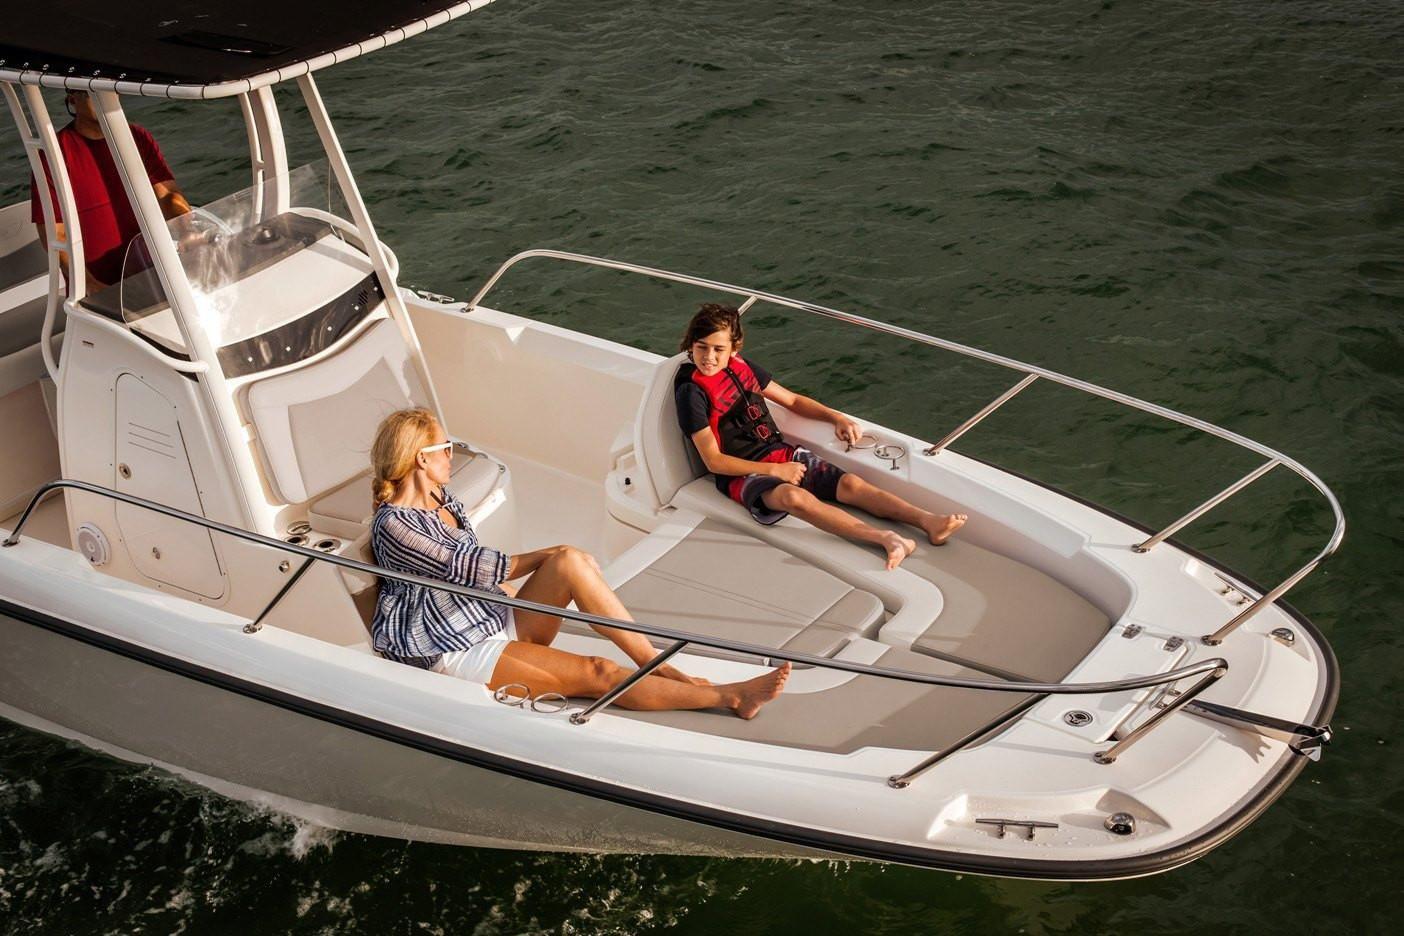 Photo 5 for 2021 Boston Whaler 240 Dauntless